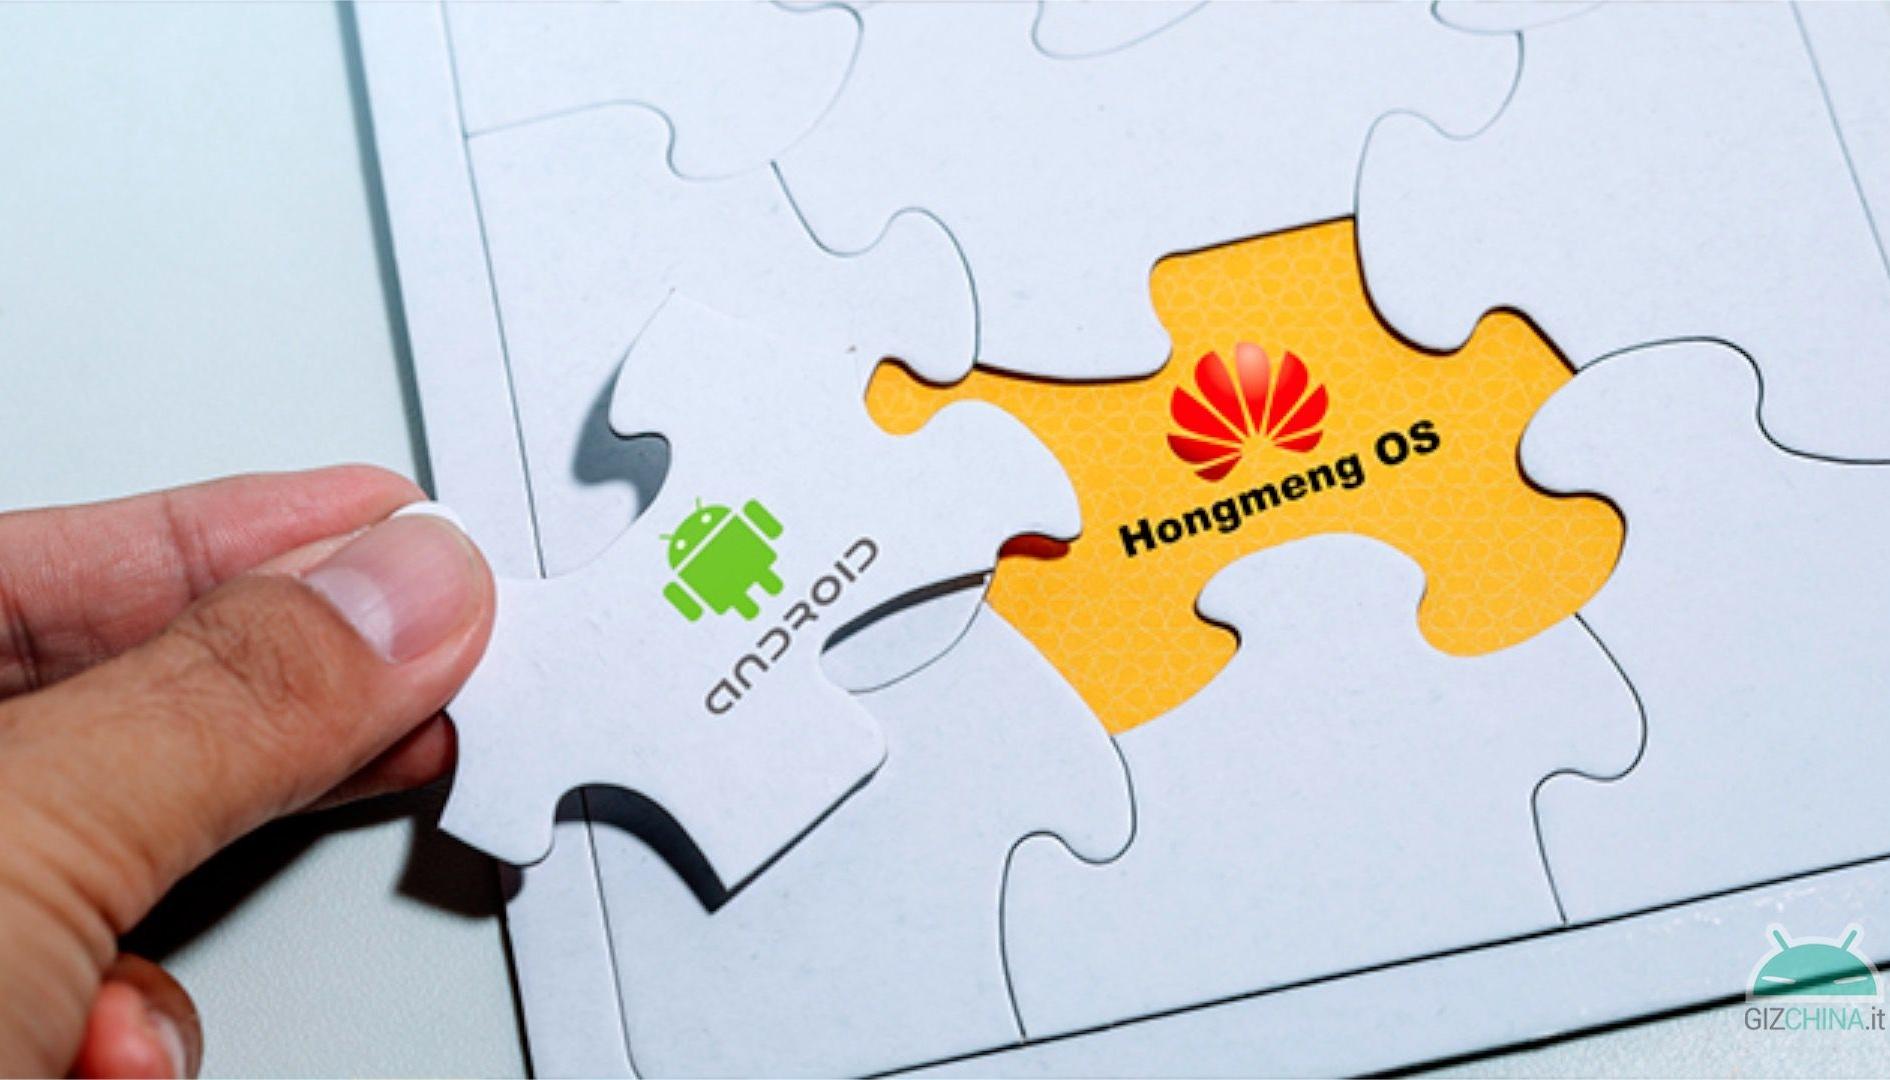 Huawei, lo smartphone con HongMeng OS potrebbe arrivare entro il 2019